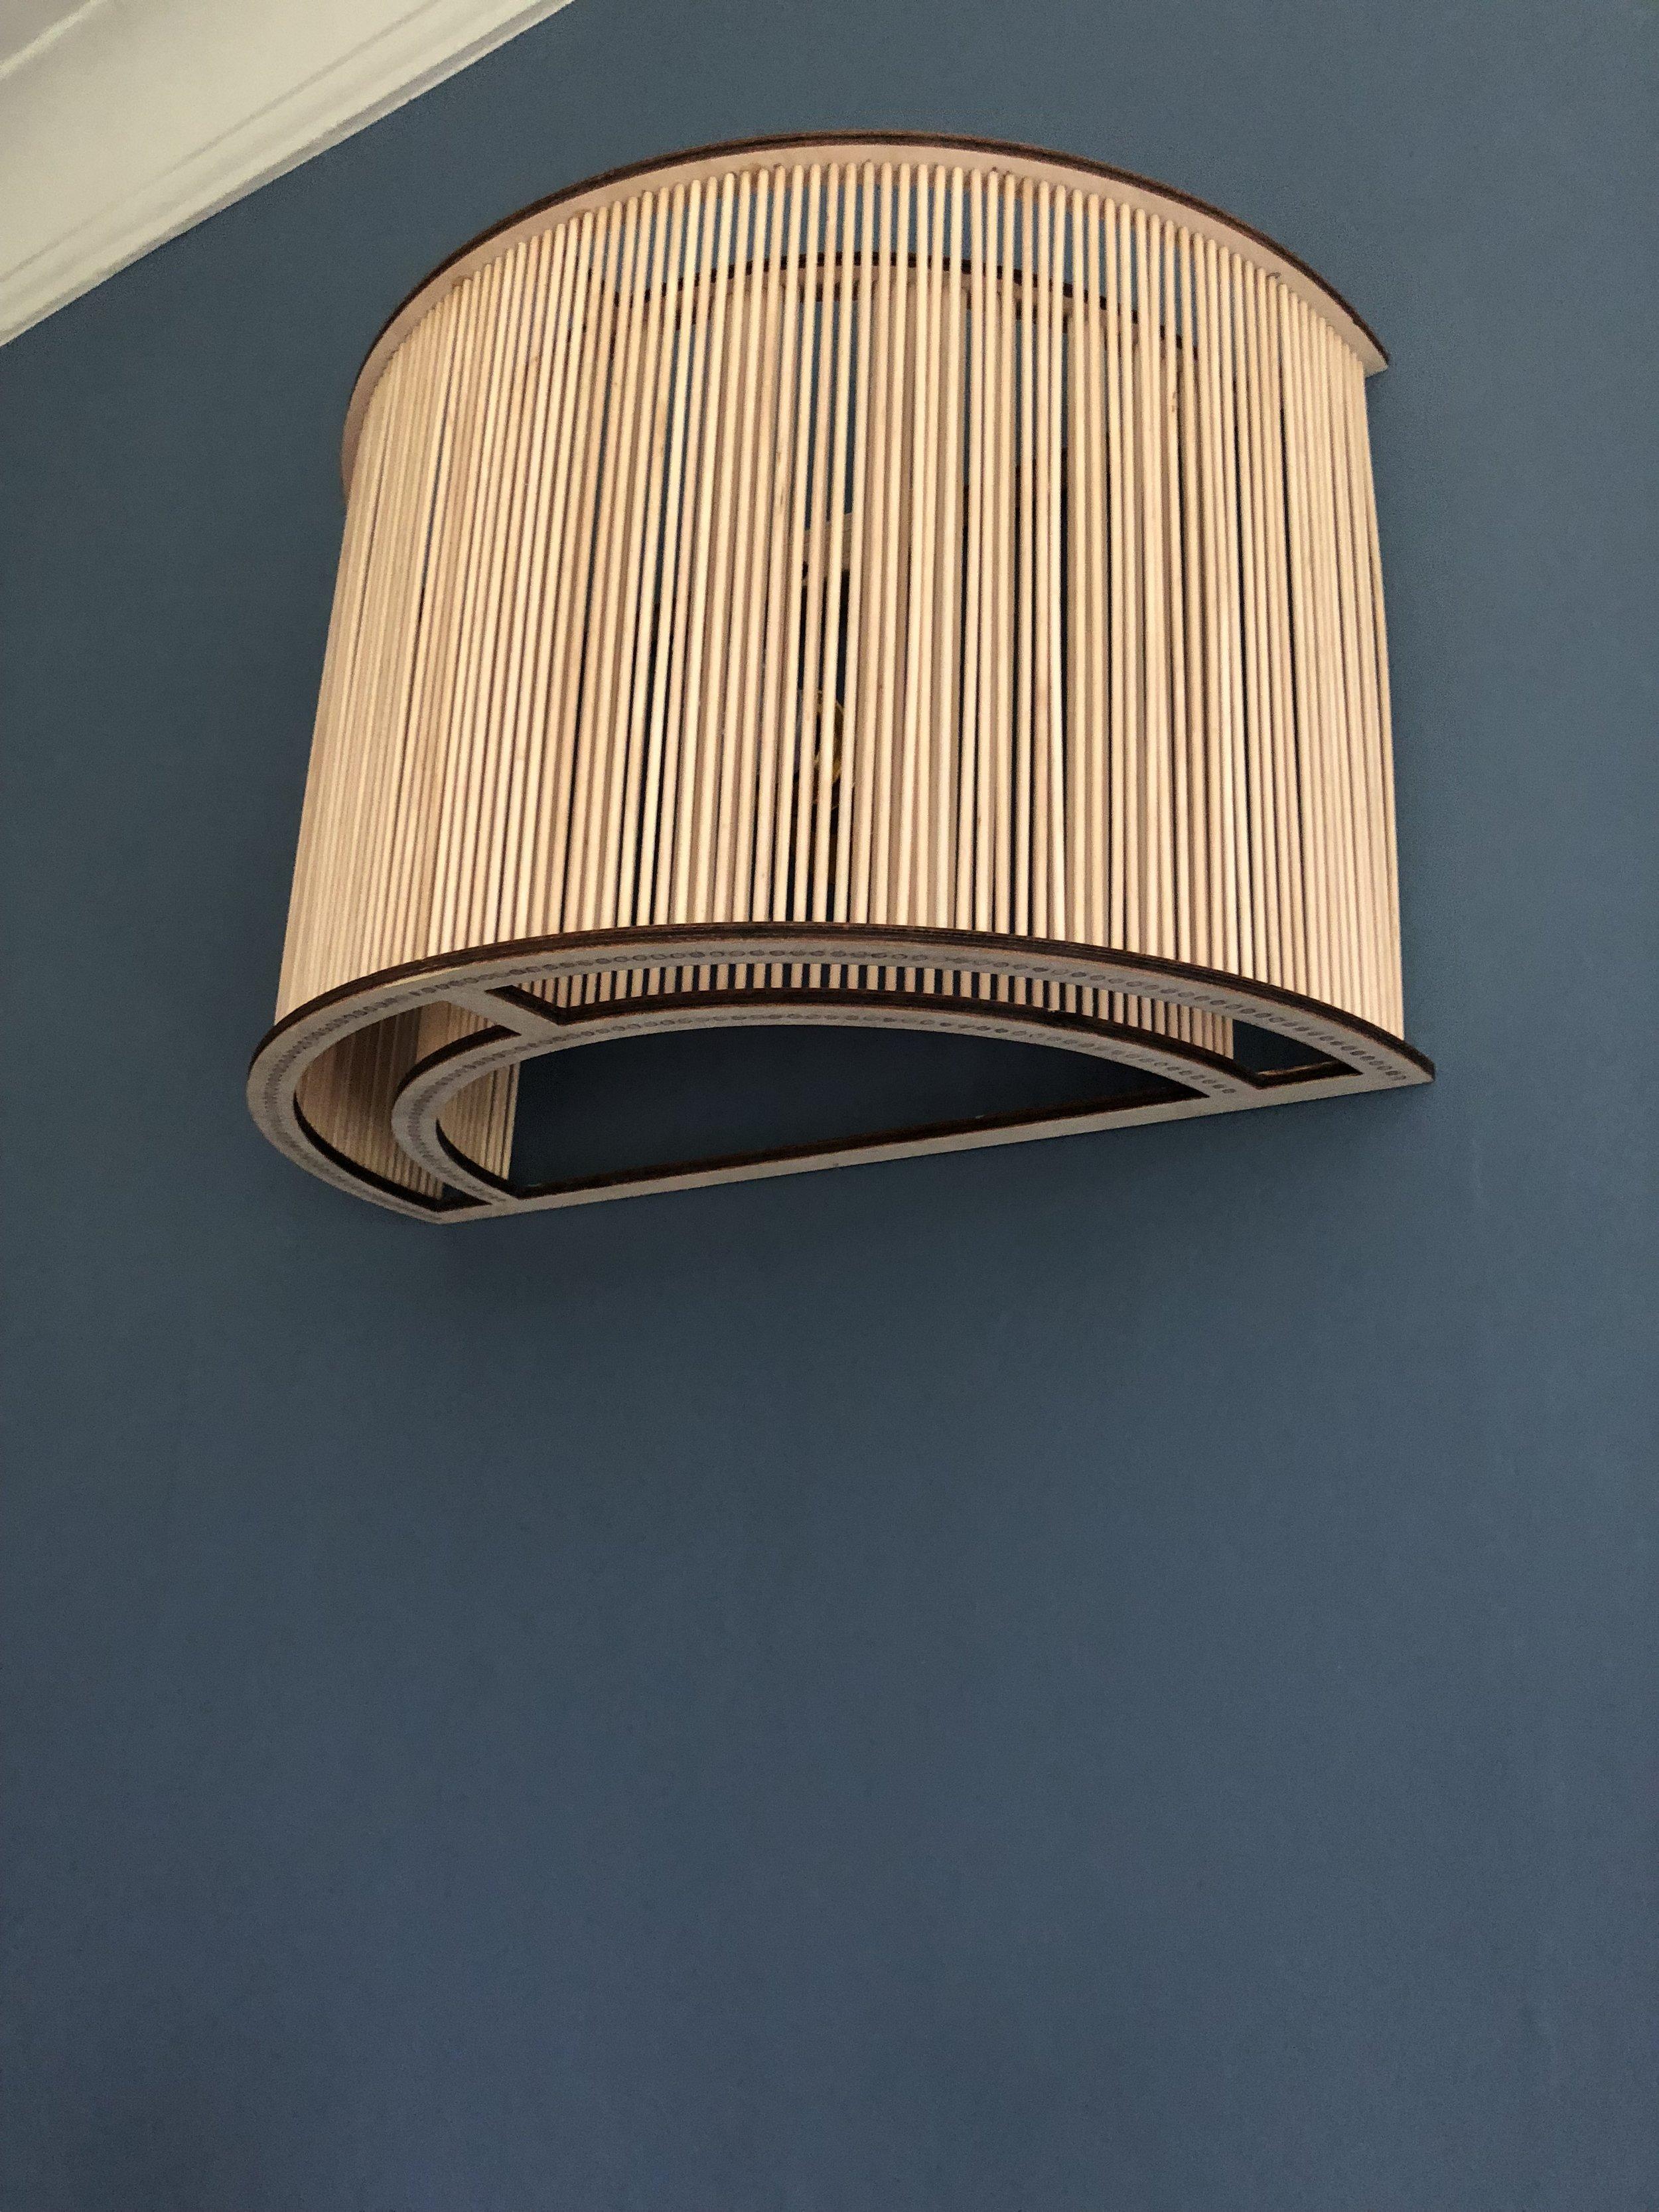 Lighting design -     Normal.dotm  0  0  1  59  340  Mimos Interiors  2  1  417  12.0             0  false      18 pt  18 pt  0  0    false  false  false                       /* Style Definitions */ table.MsoNormalTable {mso-style-name: